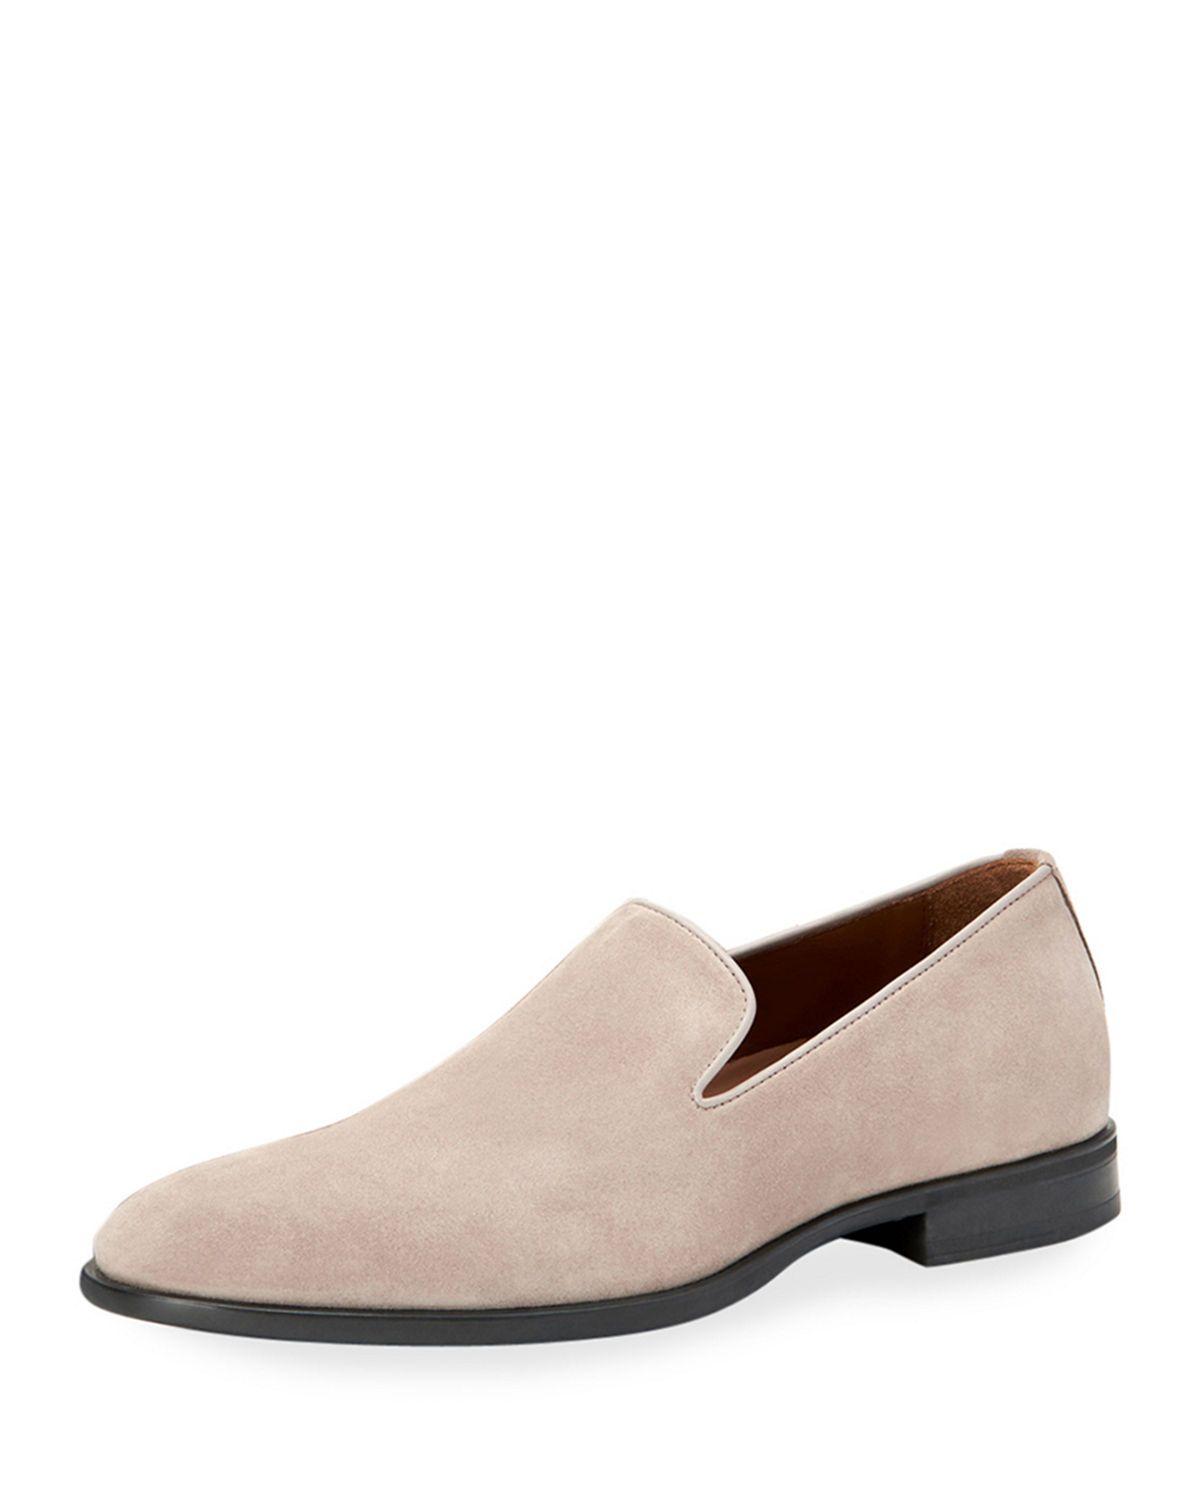 8dfe7e79e72 AQUATALIA MEN S AIDEN SUEDE SLIP-ON LOAFERS.  aquatalia  shoes ...